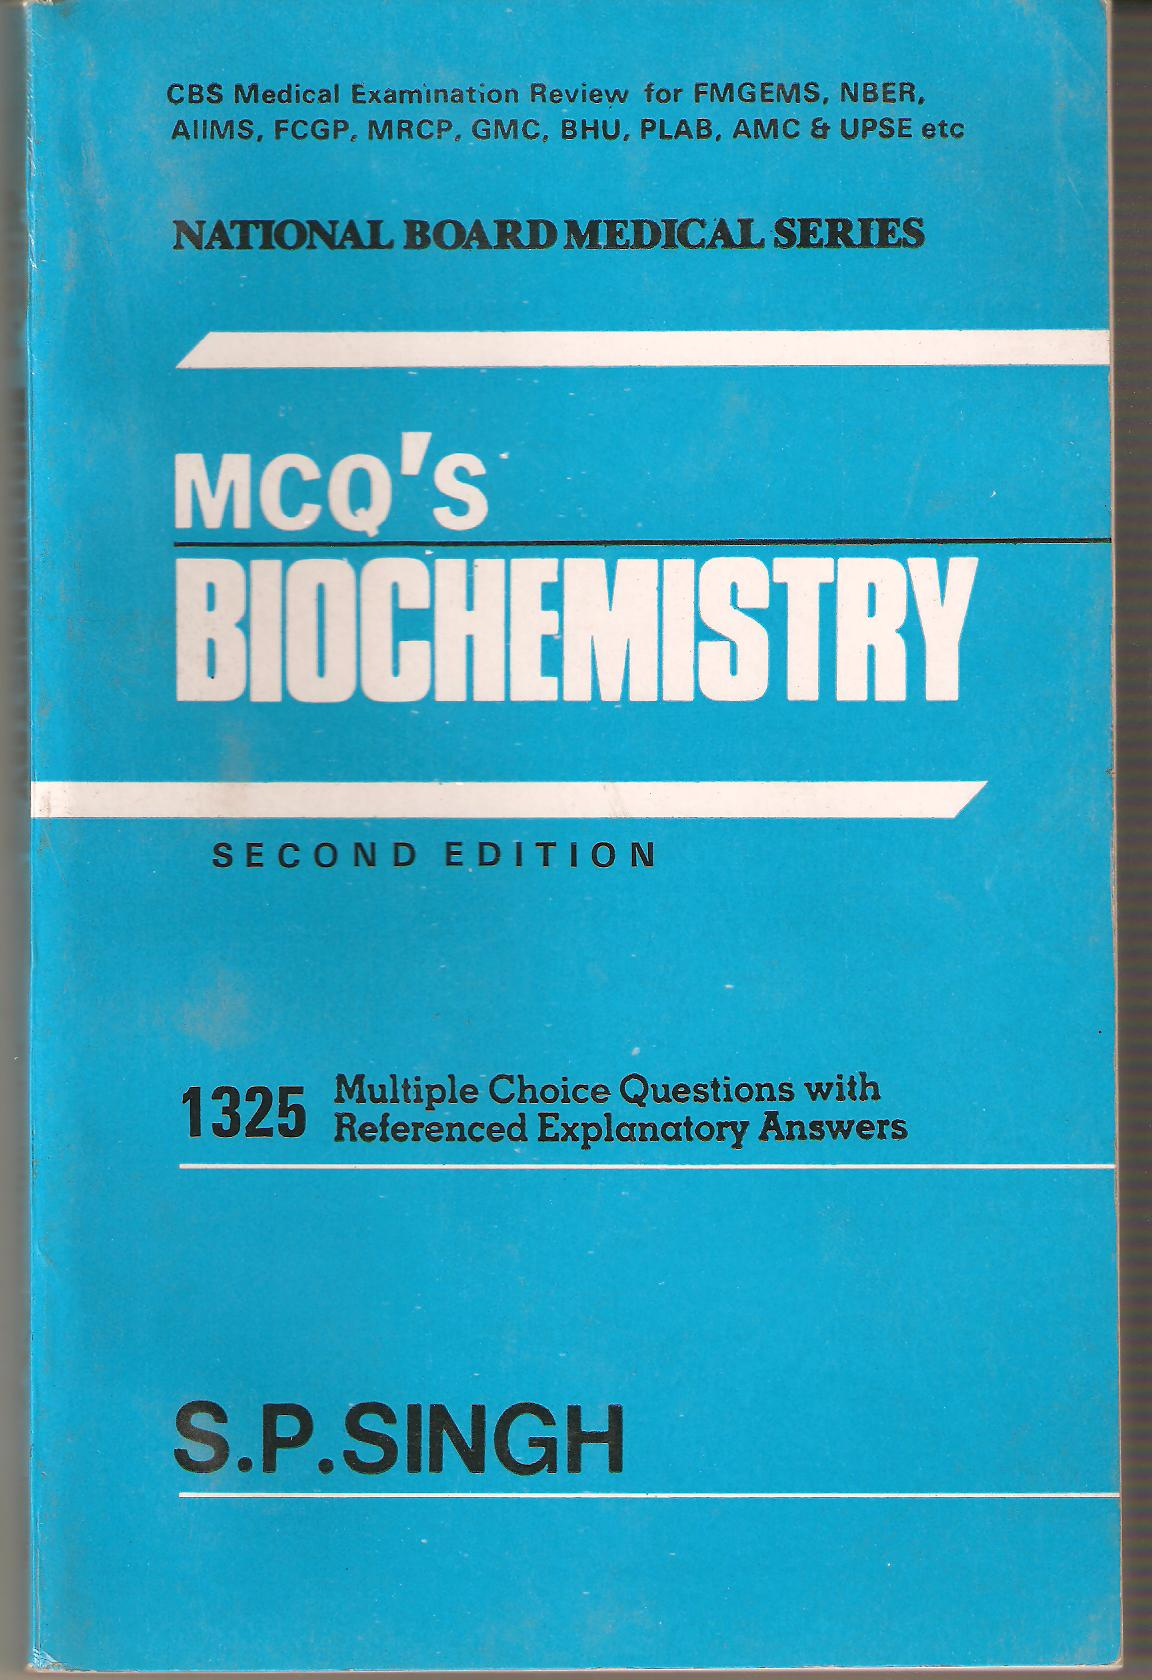 file mcq s biochemistry jpg  file mcq s biochemistry jpg